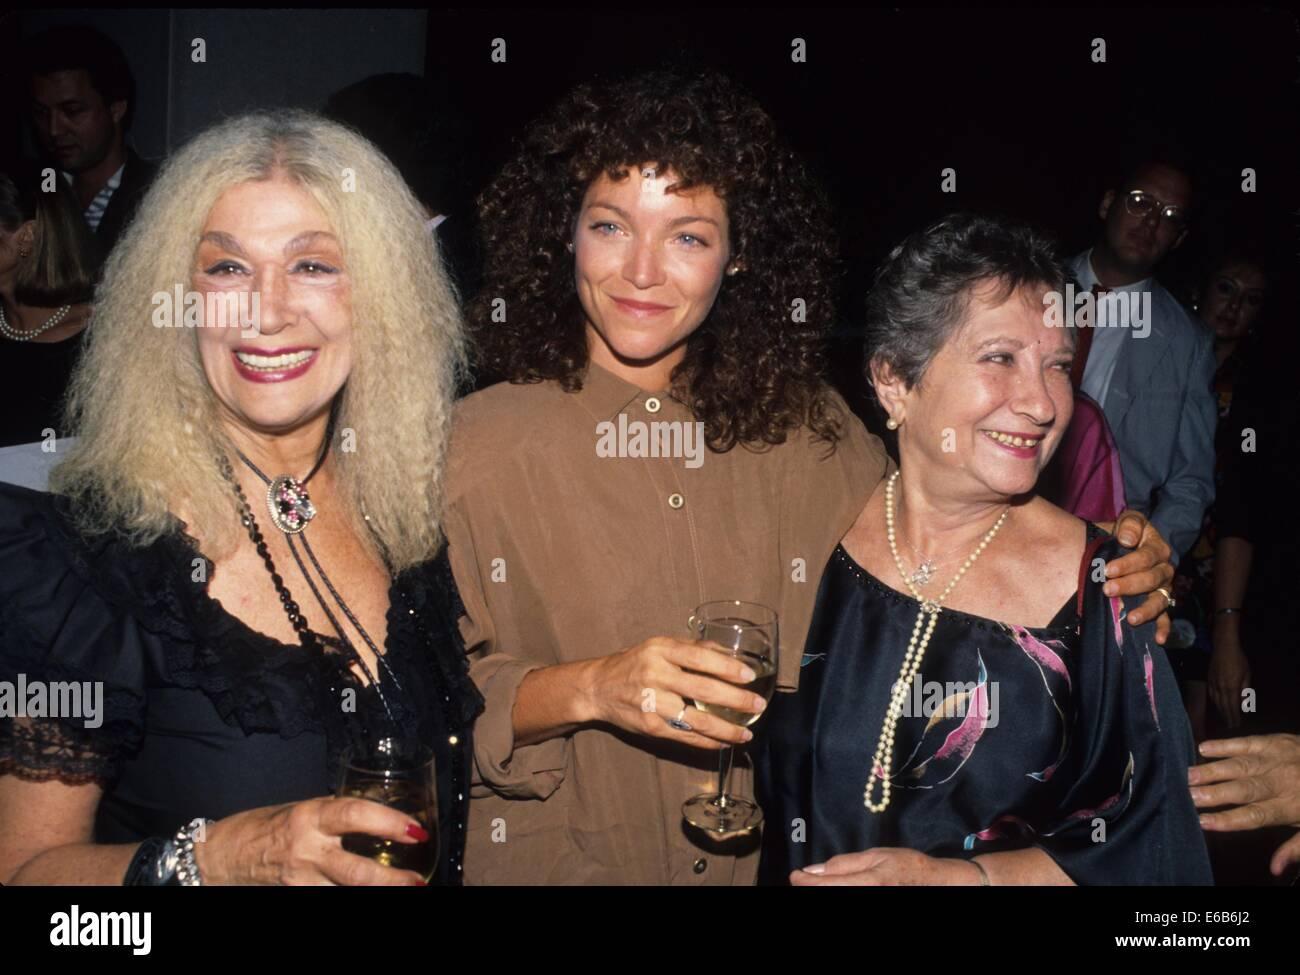 Lorraine Velez,Annabelle Huggins (b. 1943) Hot videos Cathryn Harrison,Suhasi Goradia Dhami